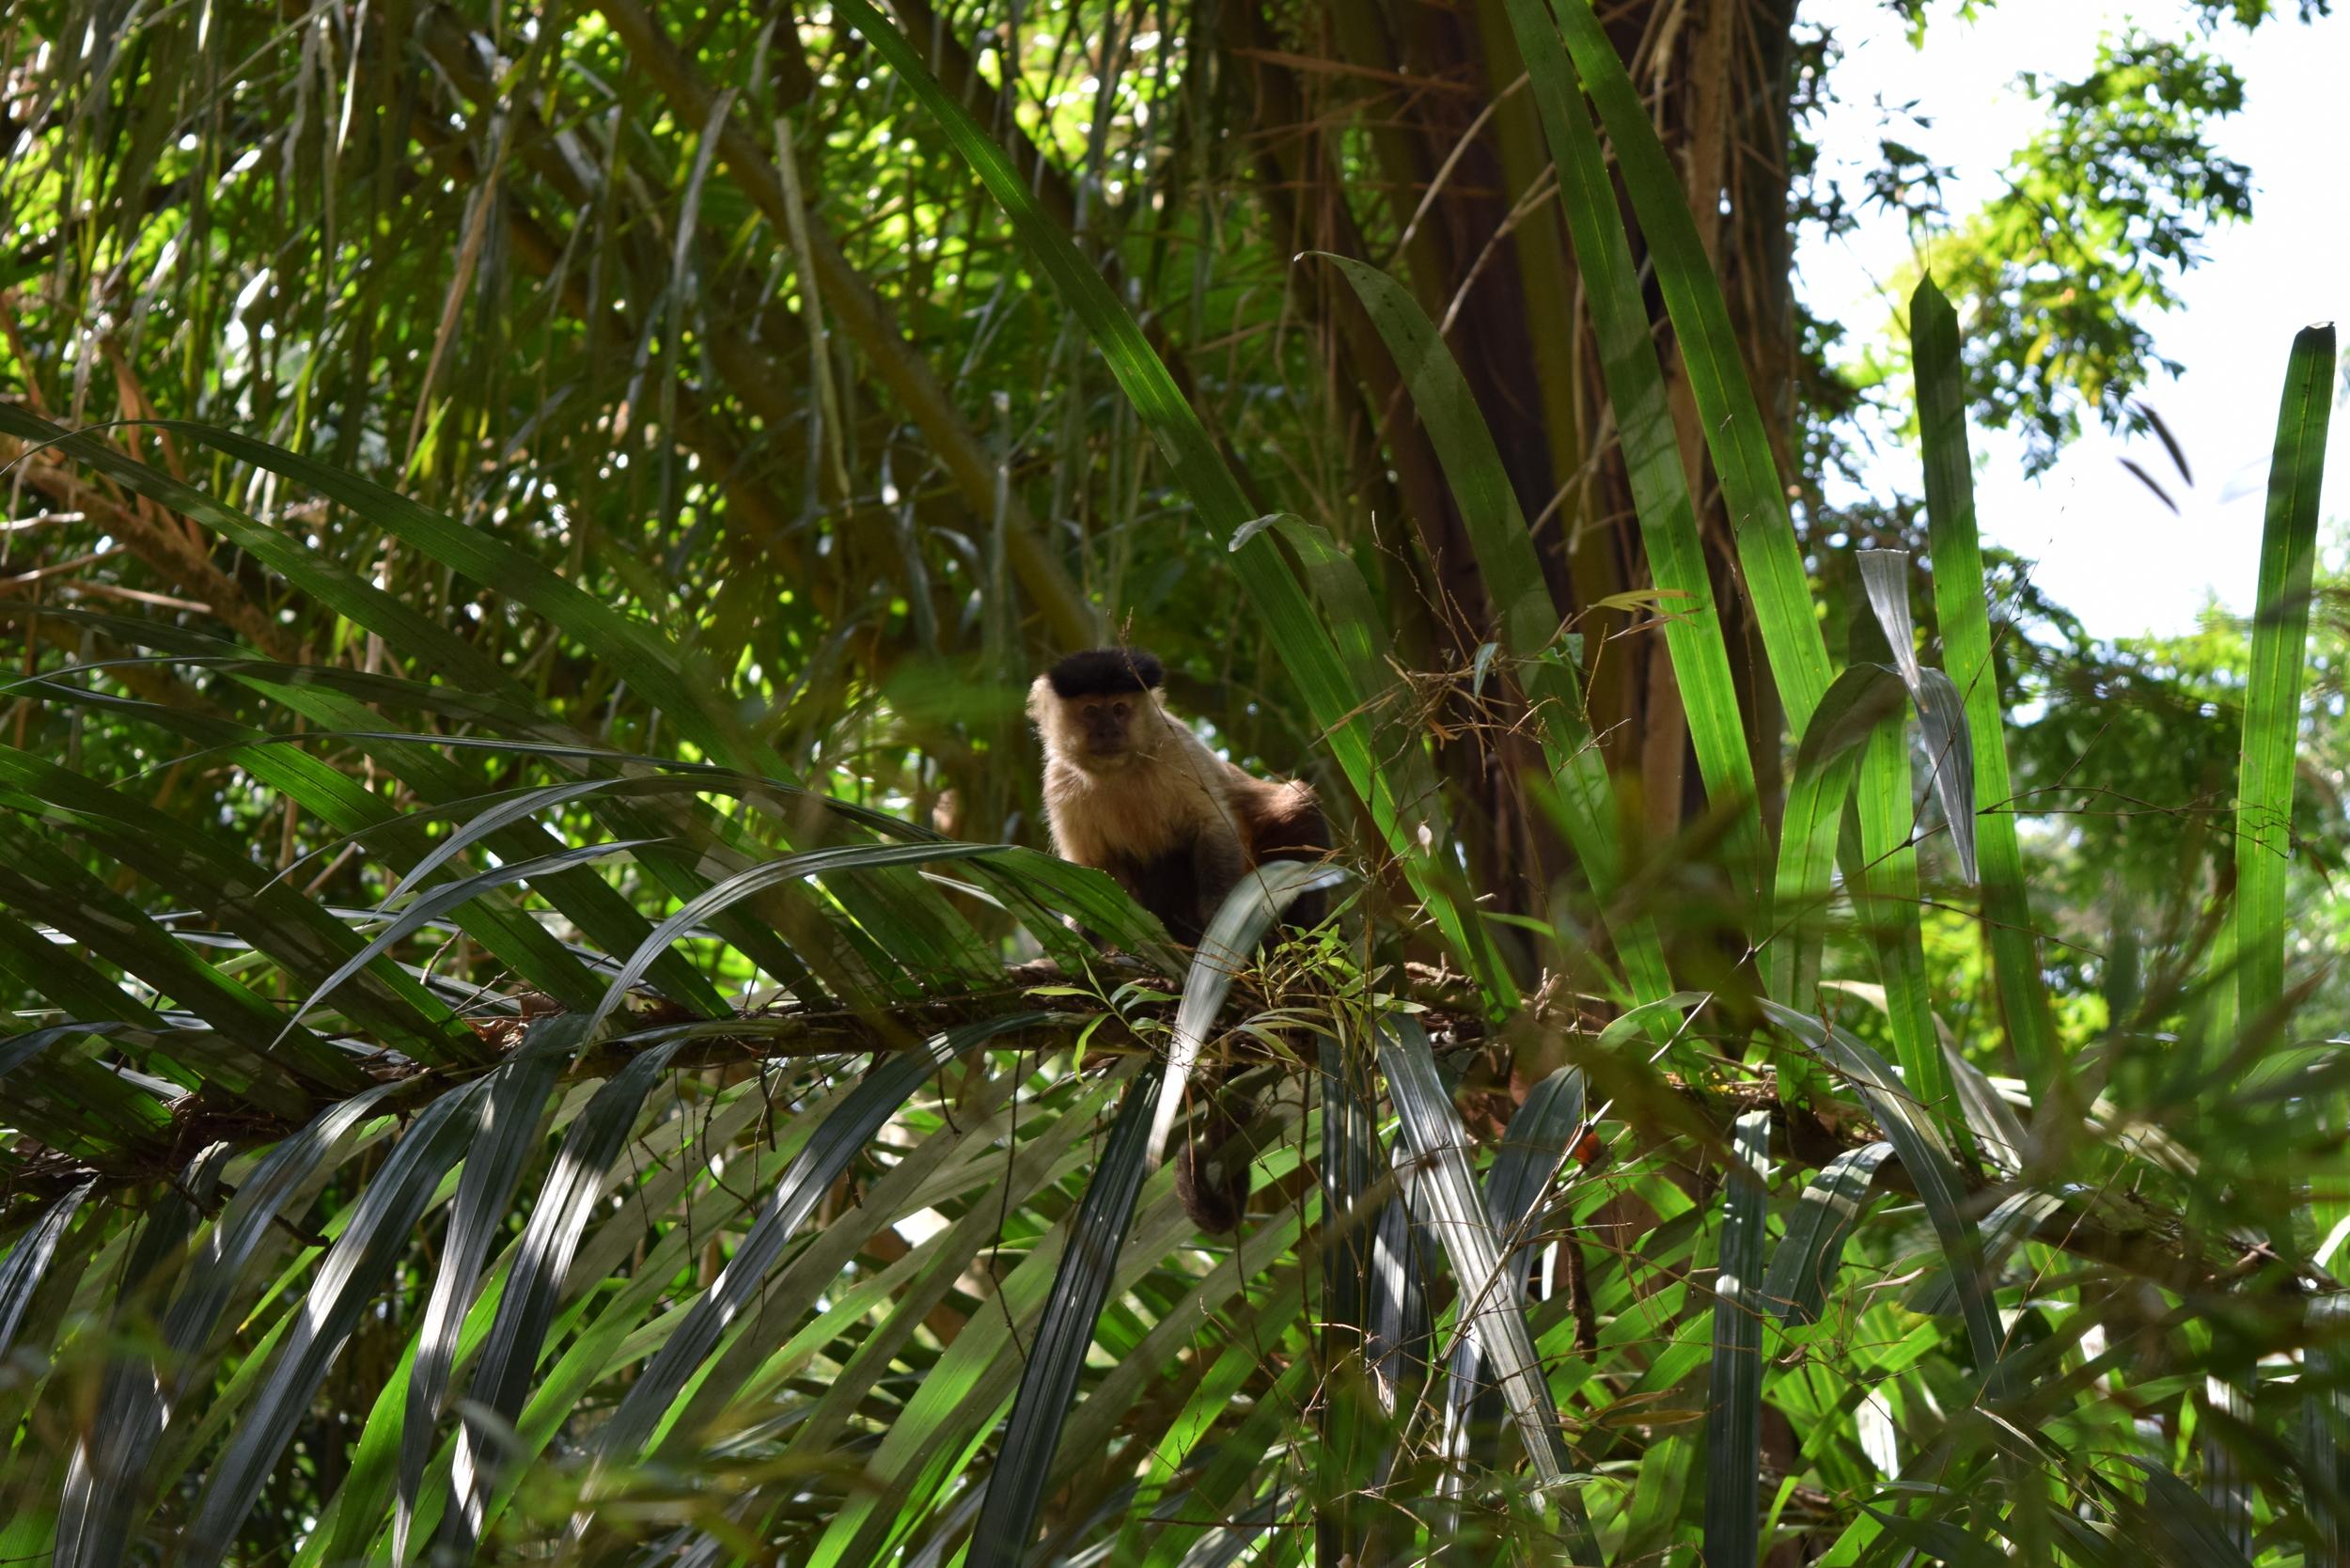 Rio-Parque-Lage-Corcovado-Hike-Fitness-Blogger-Monkey